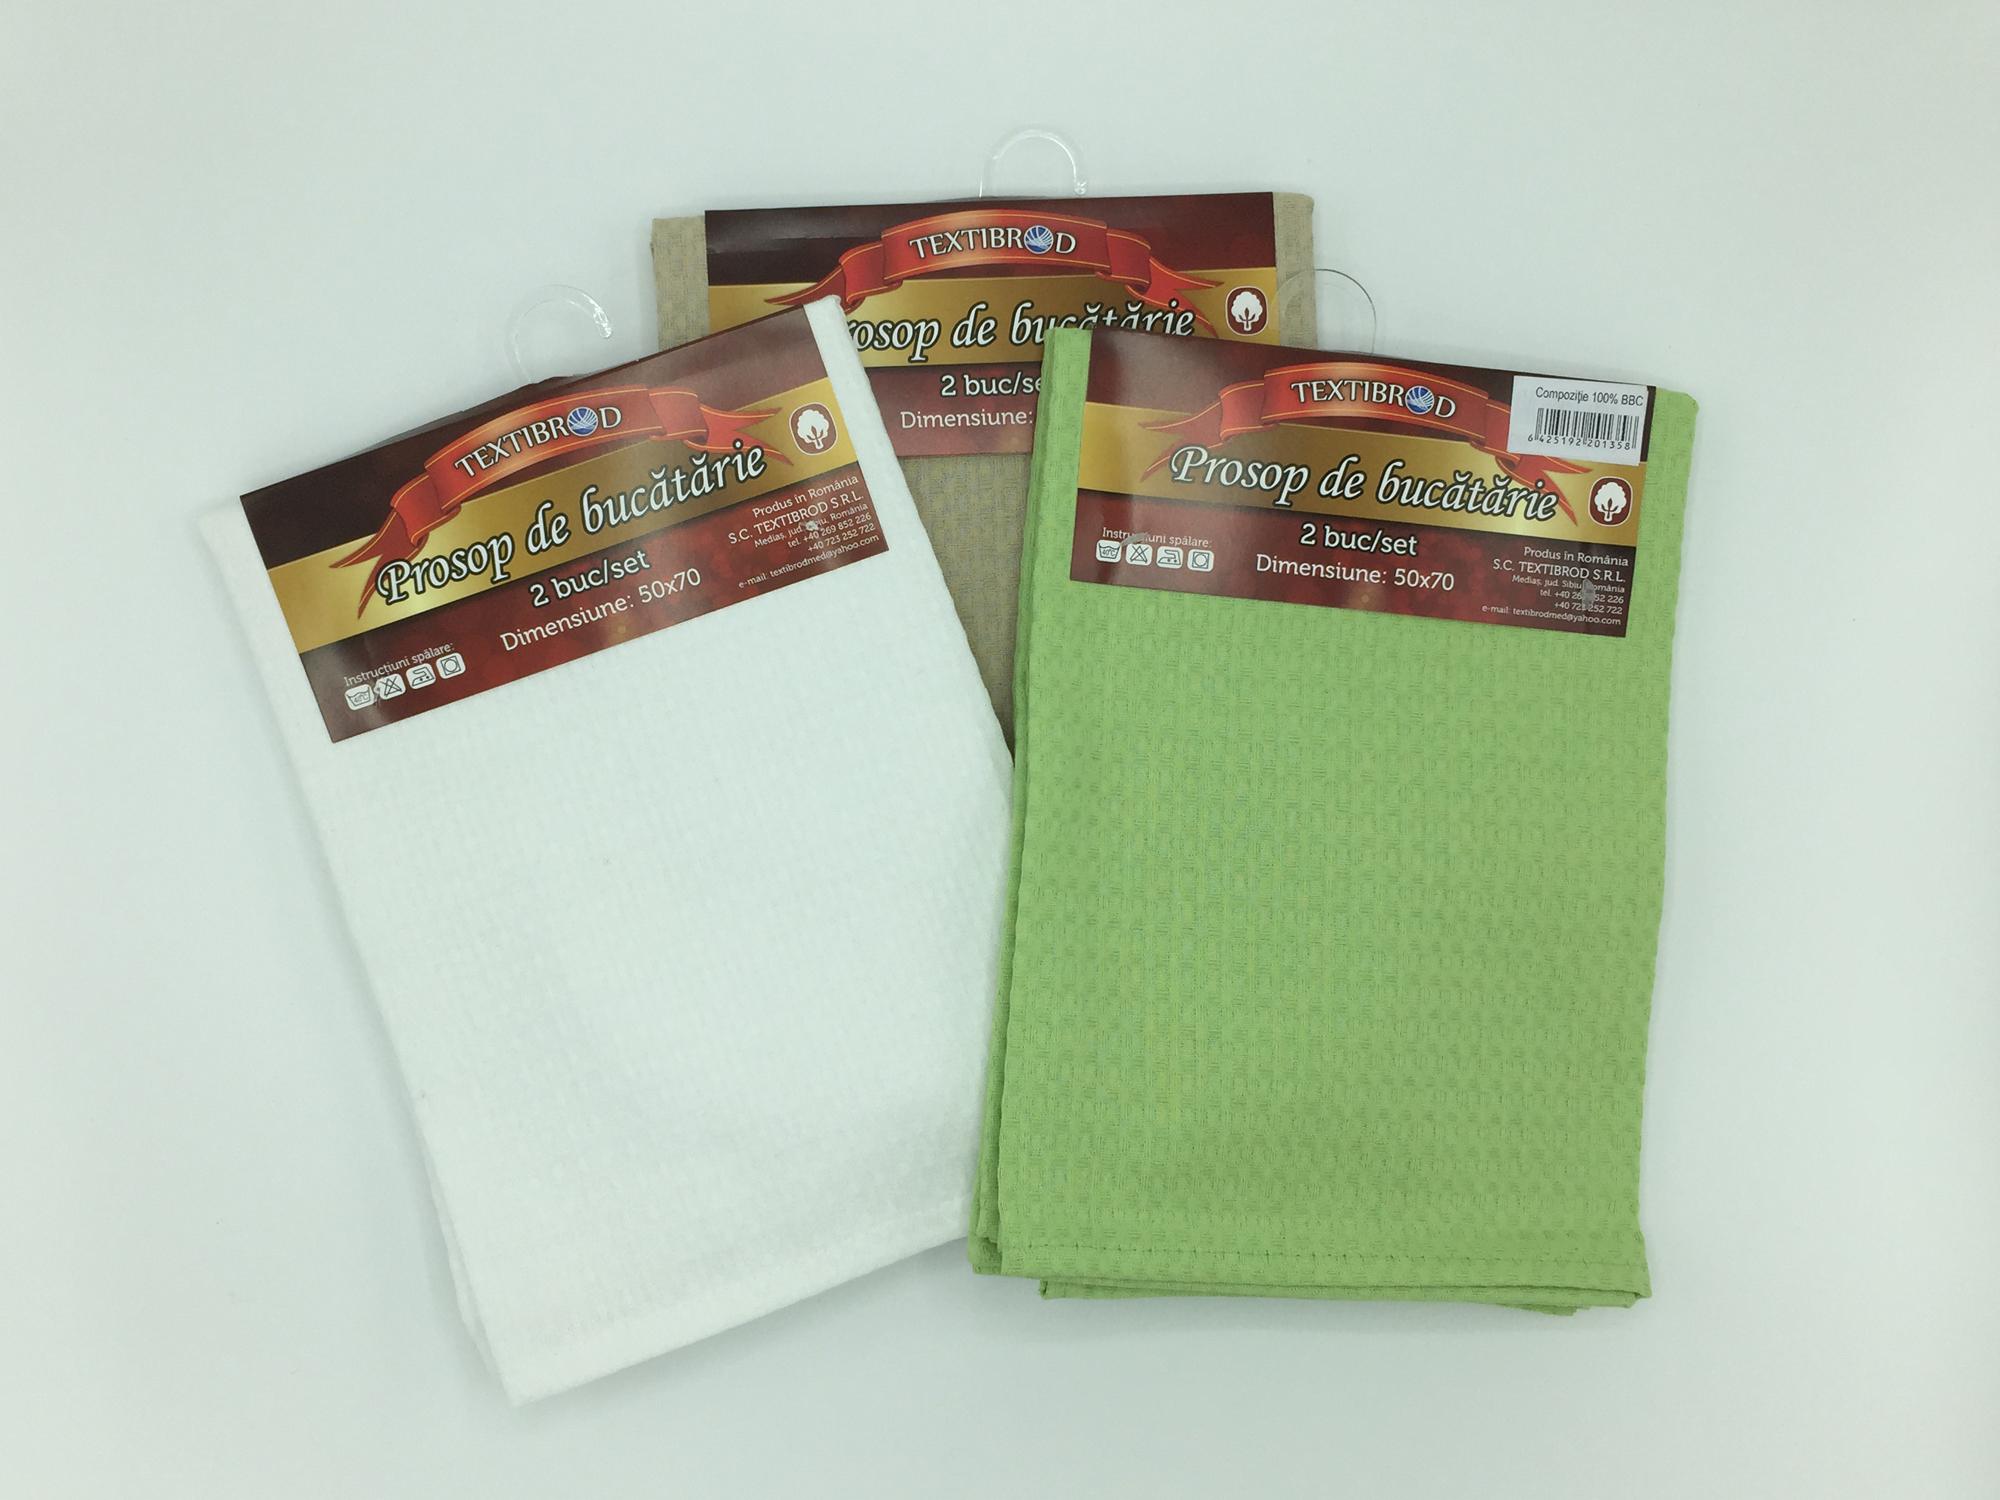 Prosop bucatarie 100% bumbac - Multicolor - 6 set - Textibrod